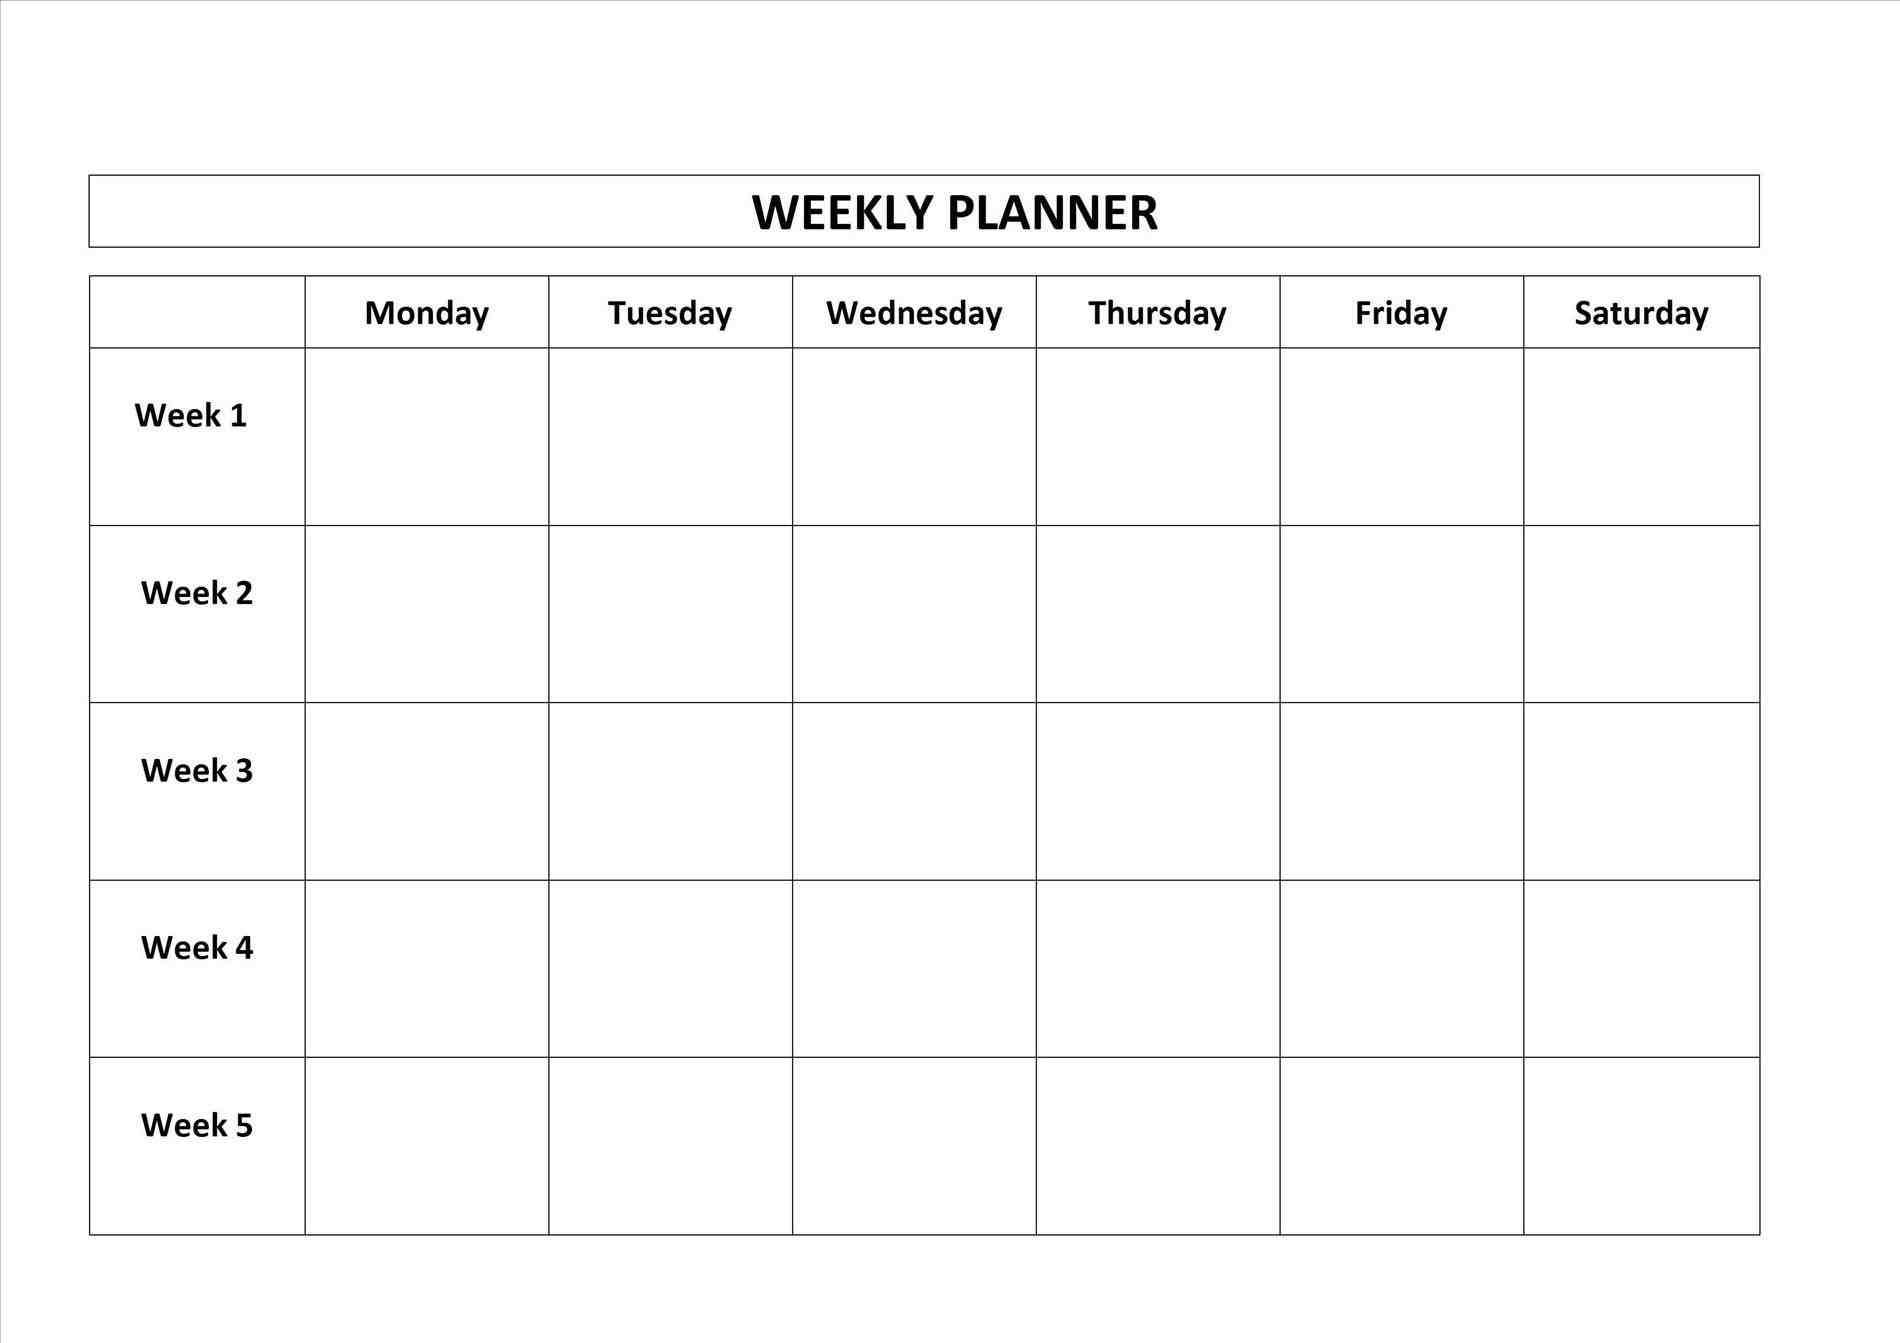 Monday Through Sunday Weekly Horizontal Calendar | Template Calendar regarding Monday Through Sunday Weekly Horizontal Calendar